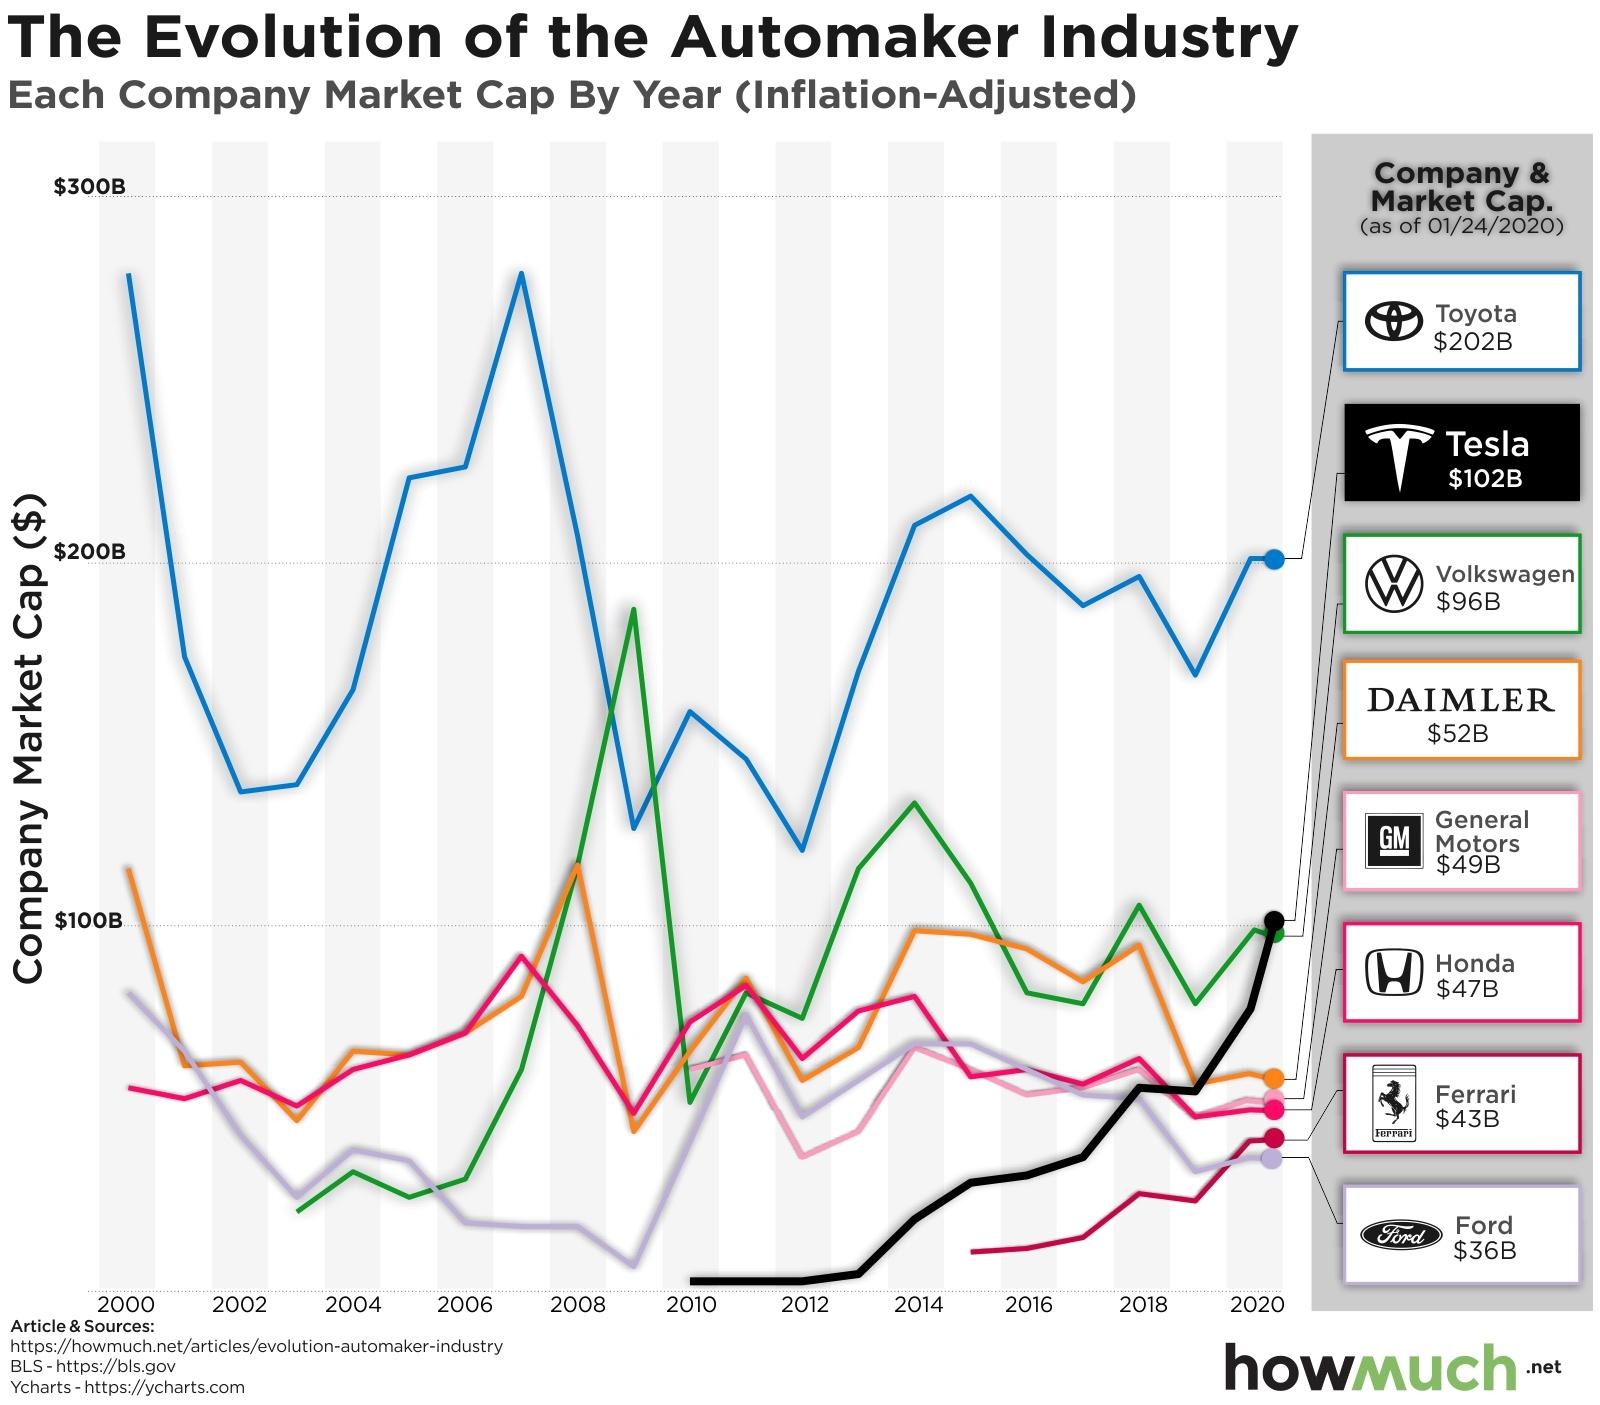 car companies by market cap